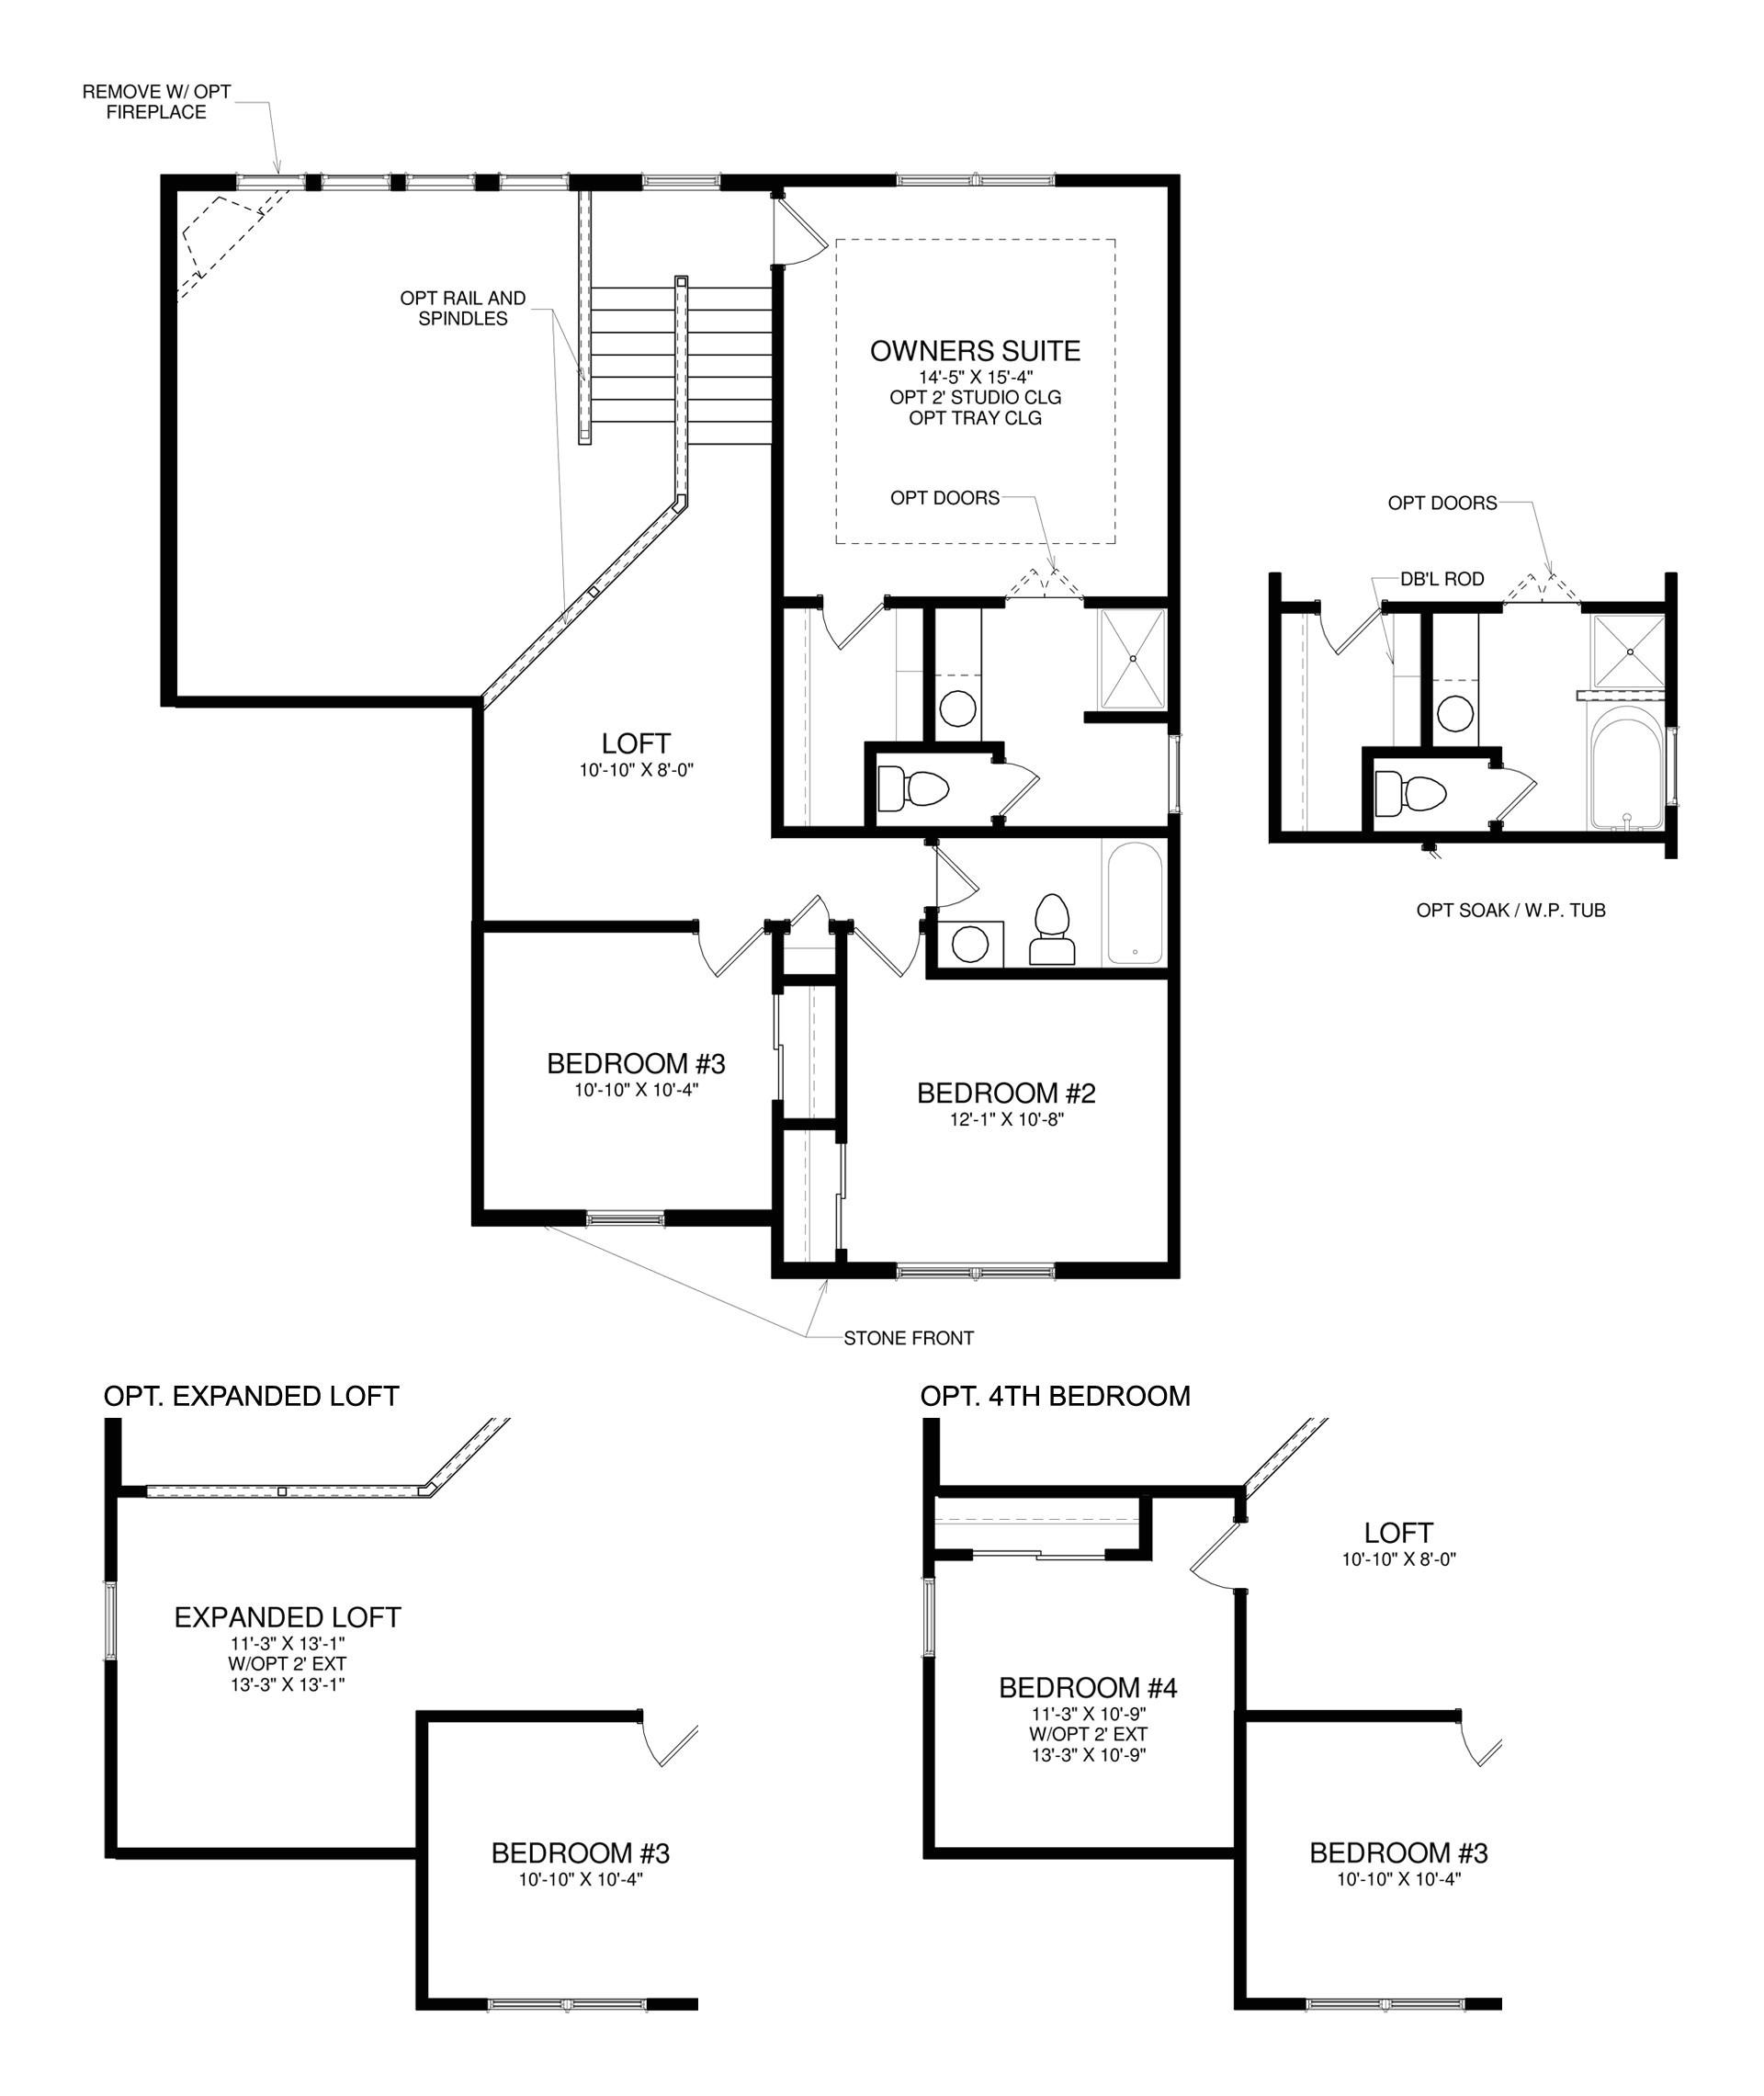 home depot repair plan awesome 16 best home depot repair plan